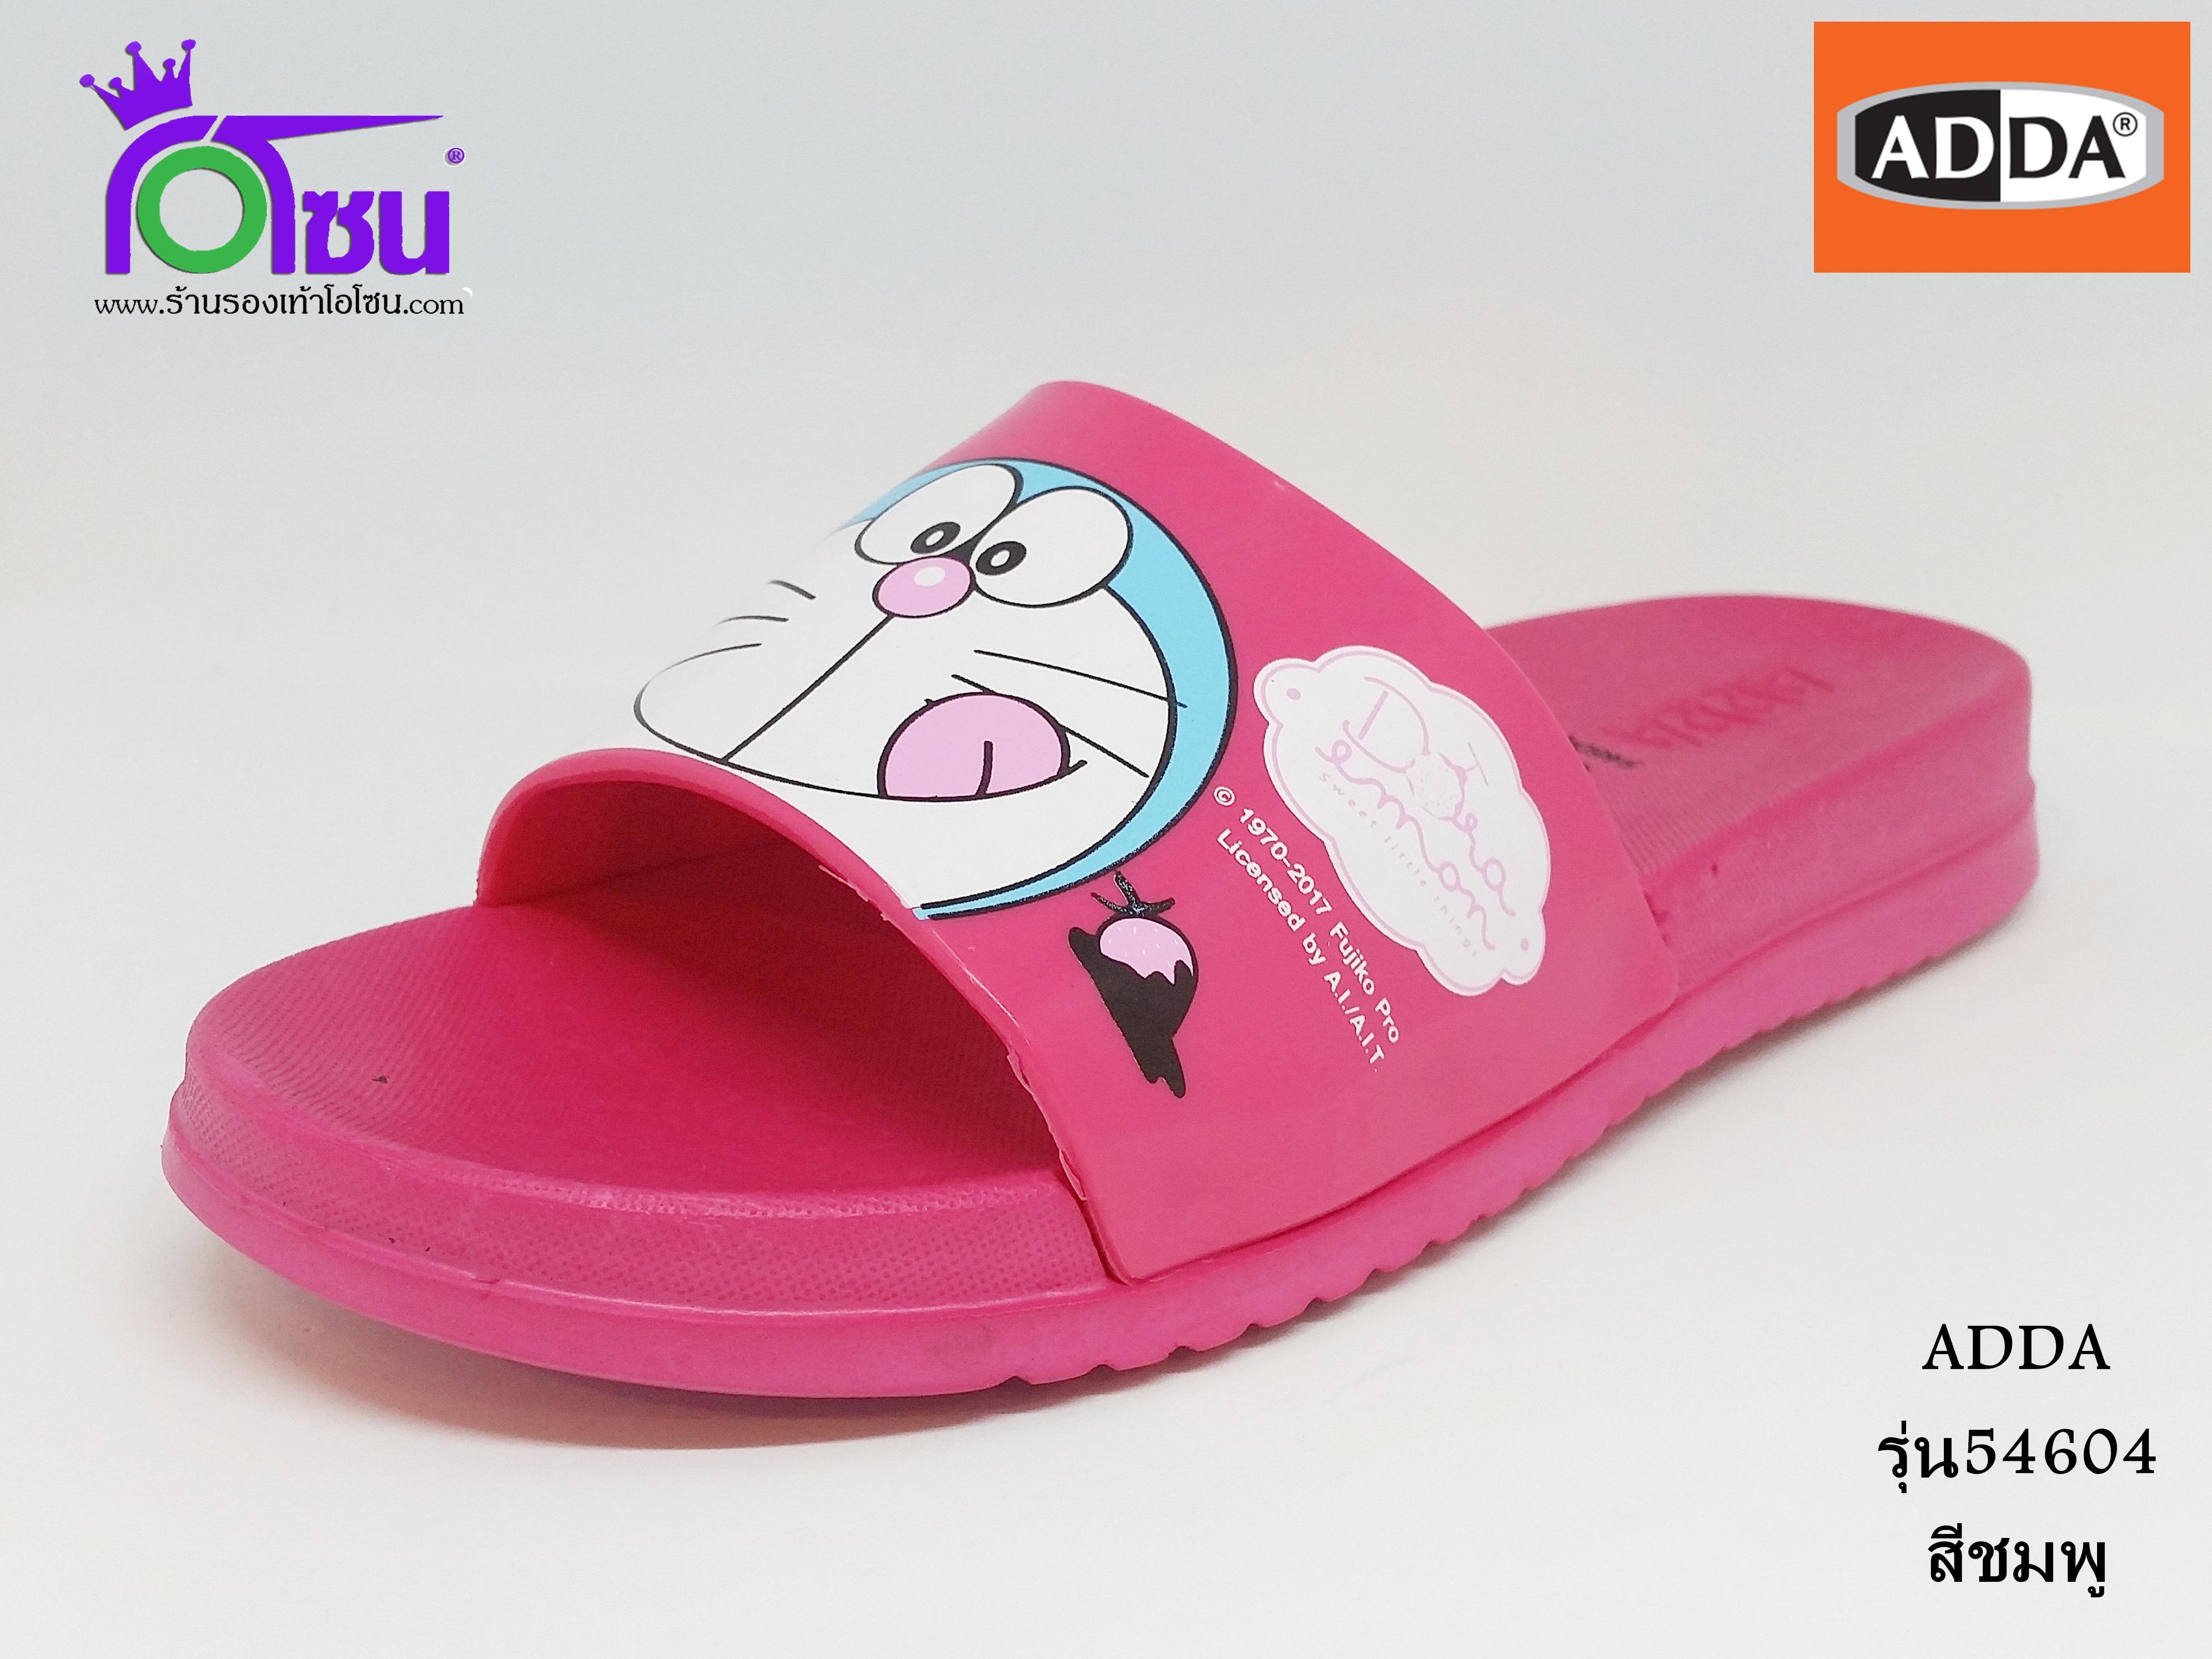 ADDA Doraemon แอ๊ดด้า โดราเอมอน รหัส 54604 สีชมพู เบอร์ 4-6